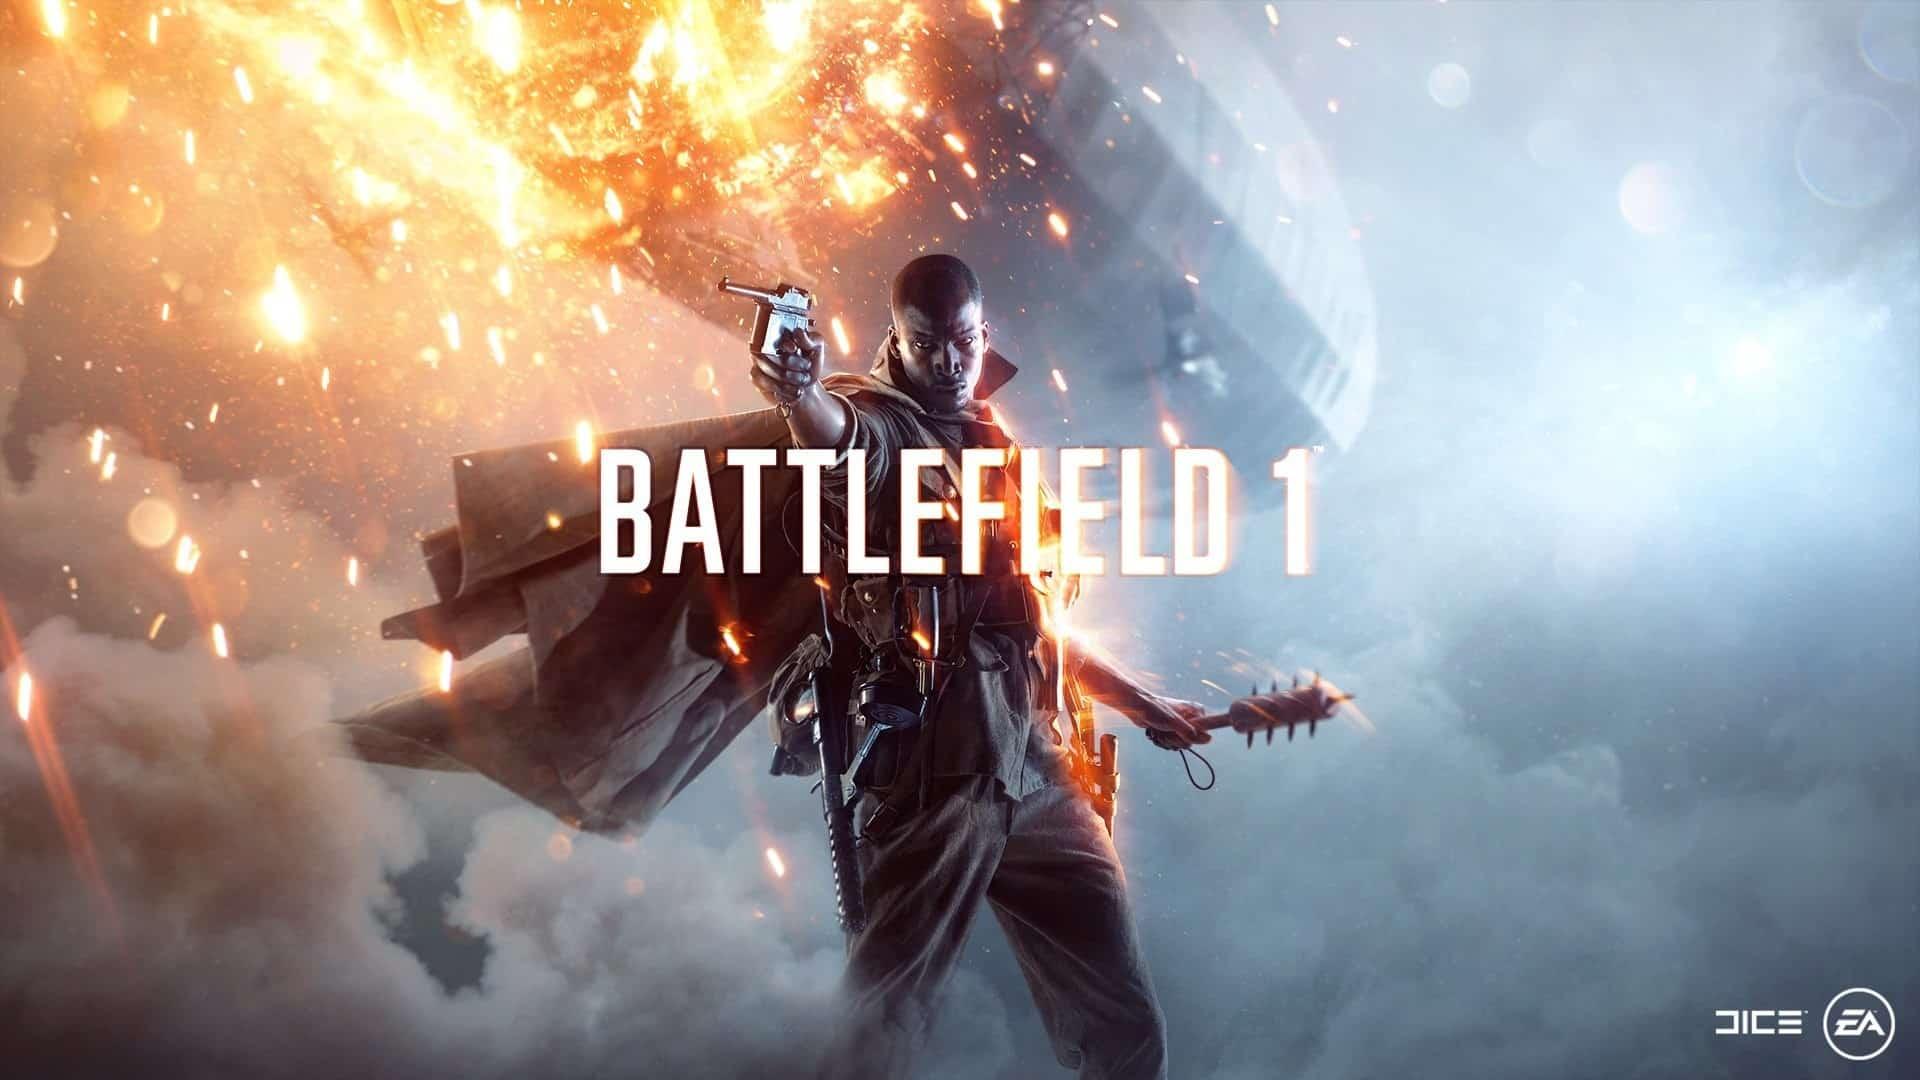 Best Selling PS4 Games - Battlefield 1